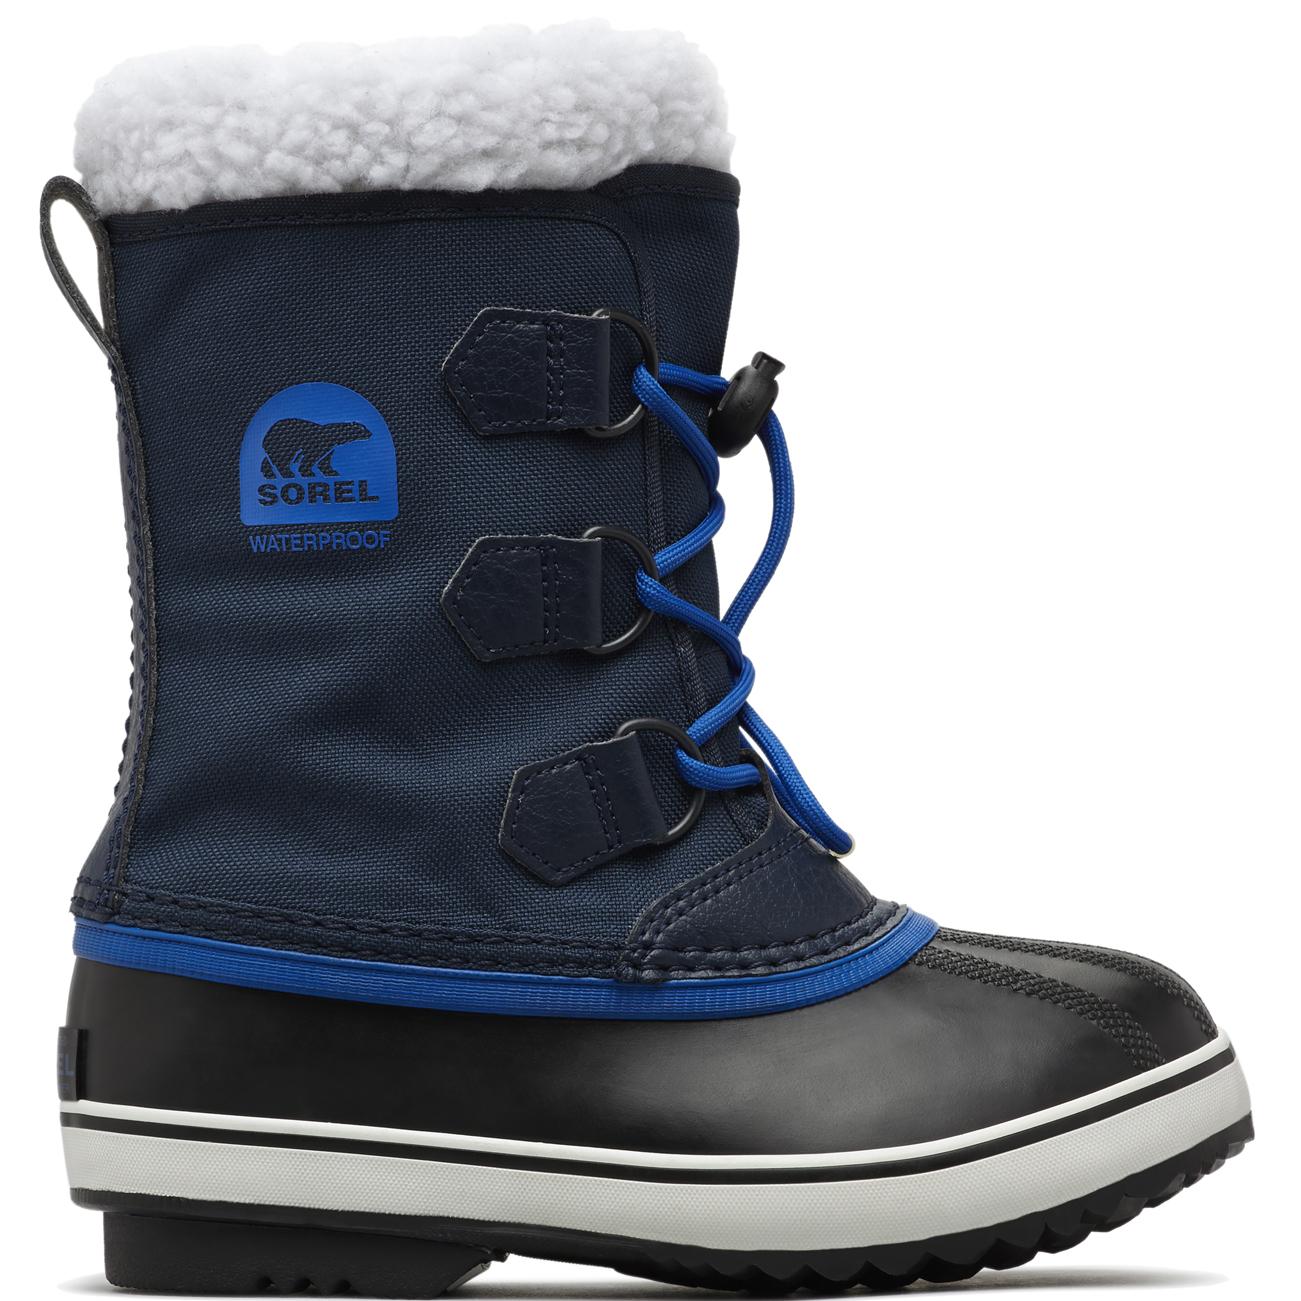 aceae9eddbb61 Unisex Kids Sorel Youth Pac Nylon Fur Lined Waterproof Ankle Snow Boots US 1 -7